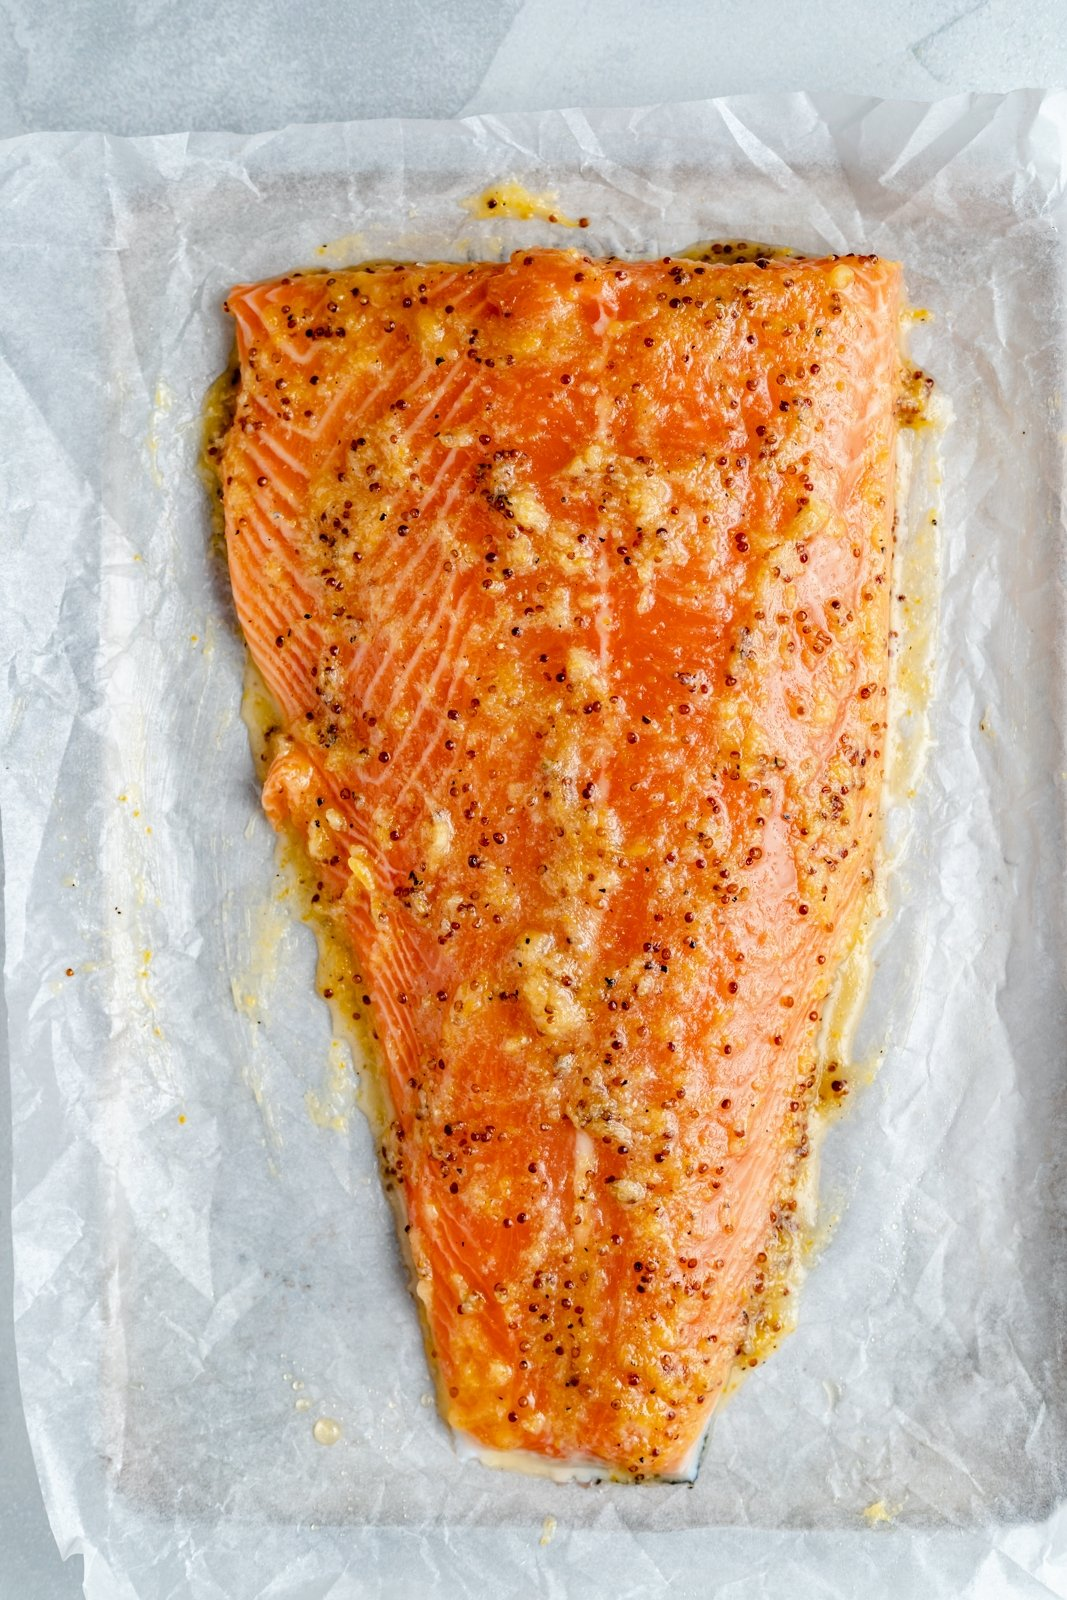 unbaked lemon garlic salmon on a baking sheet